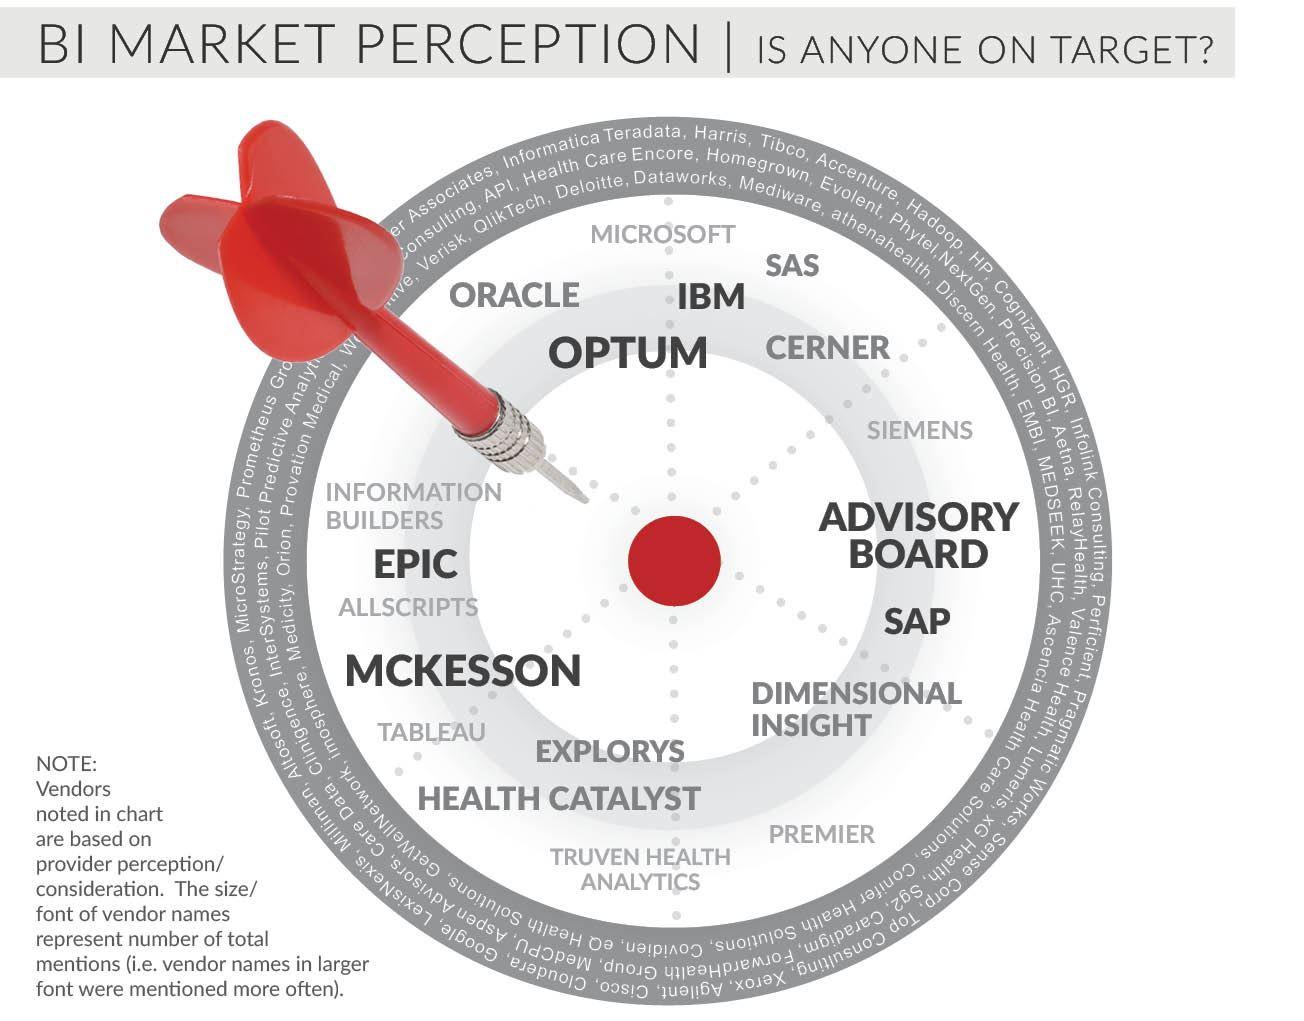 bi market perception is anyone on target